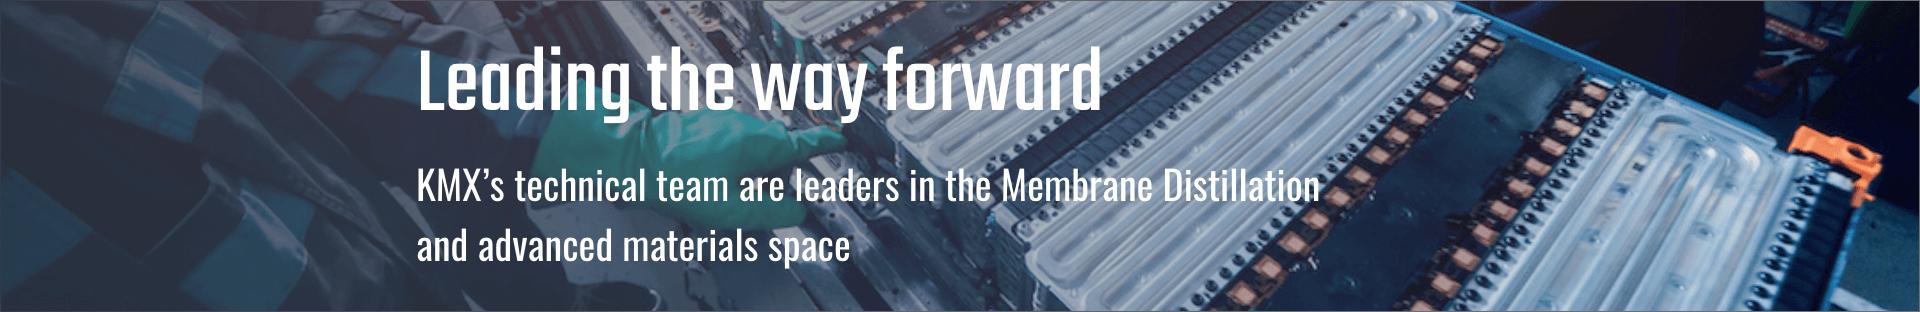 KMX team - Leading the way forward